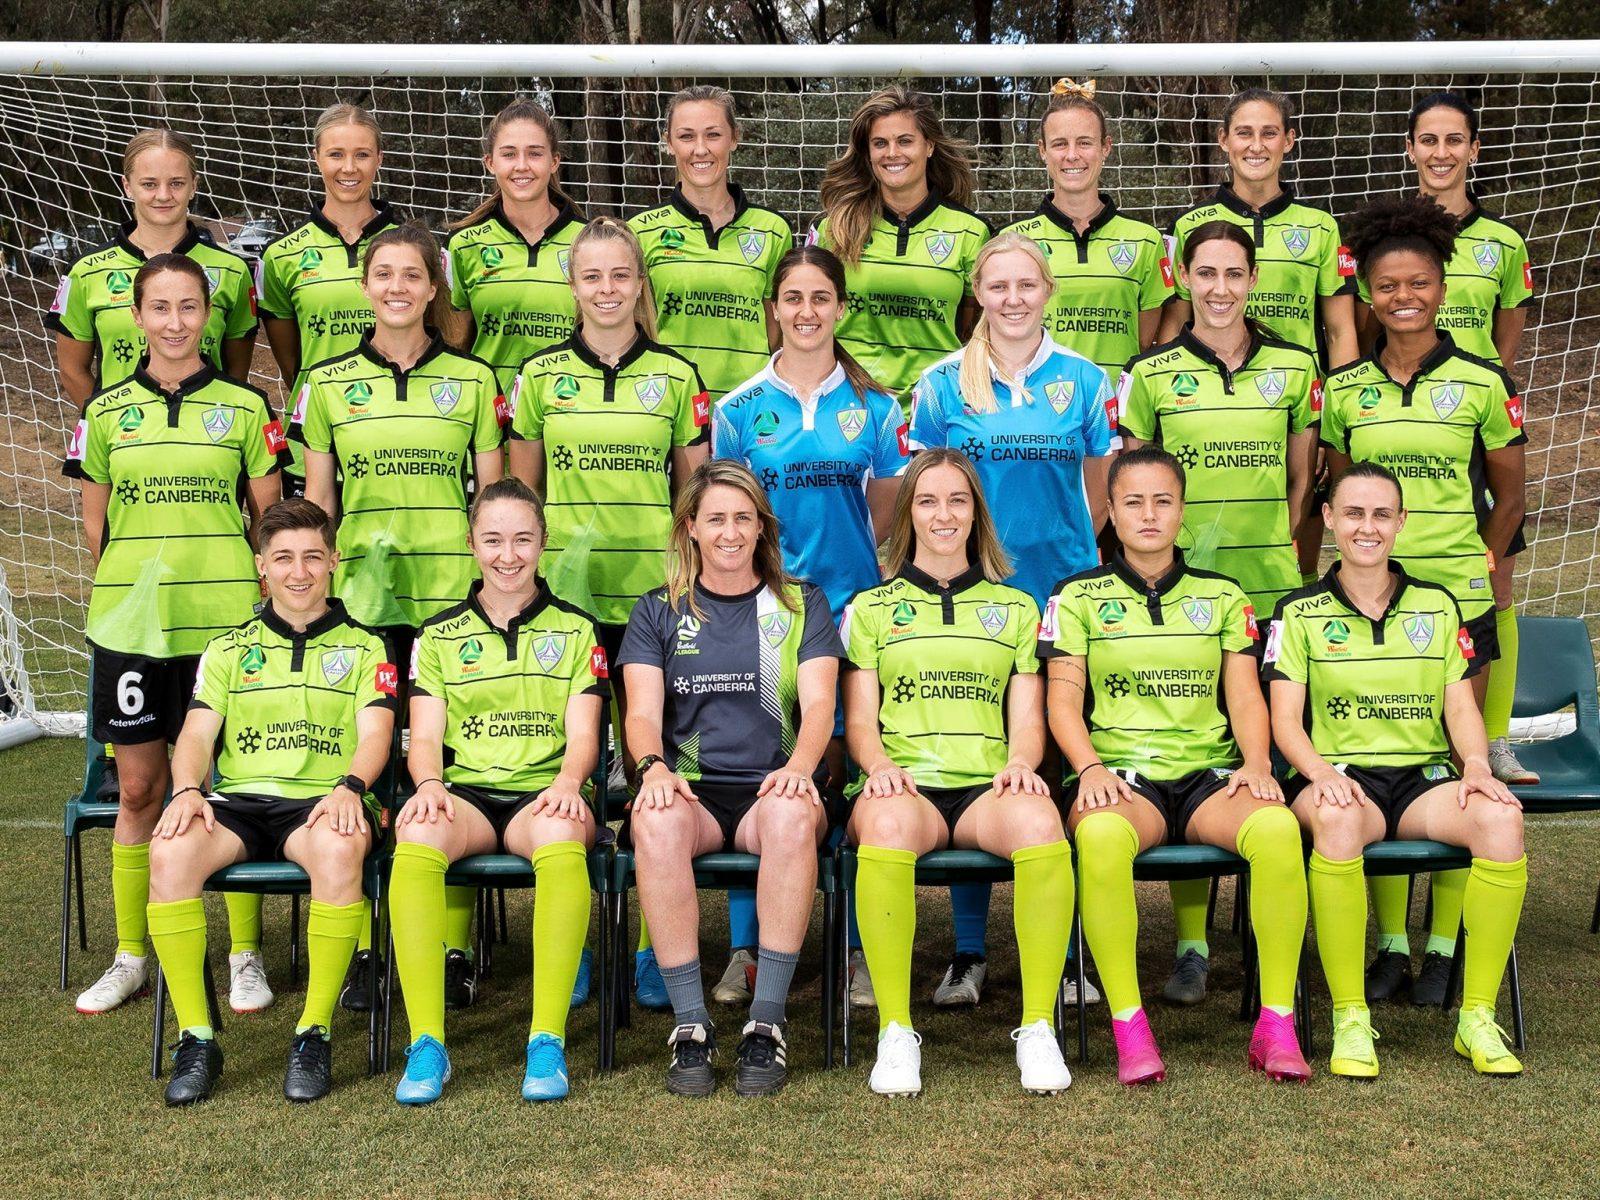 2019/20 Team Photo